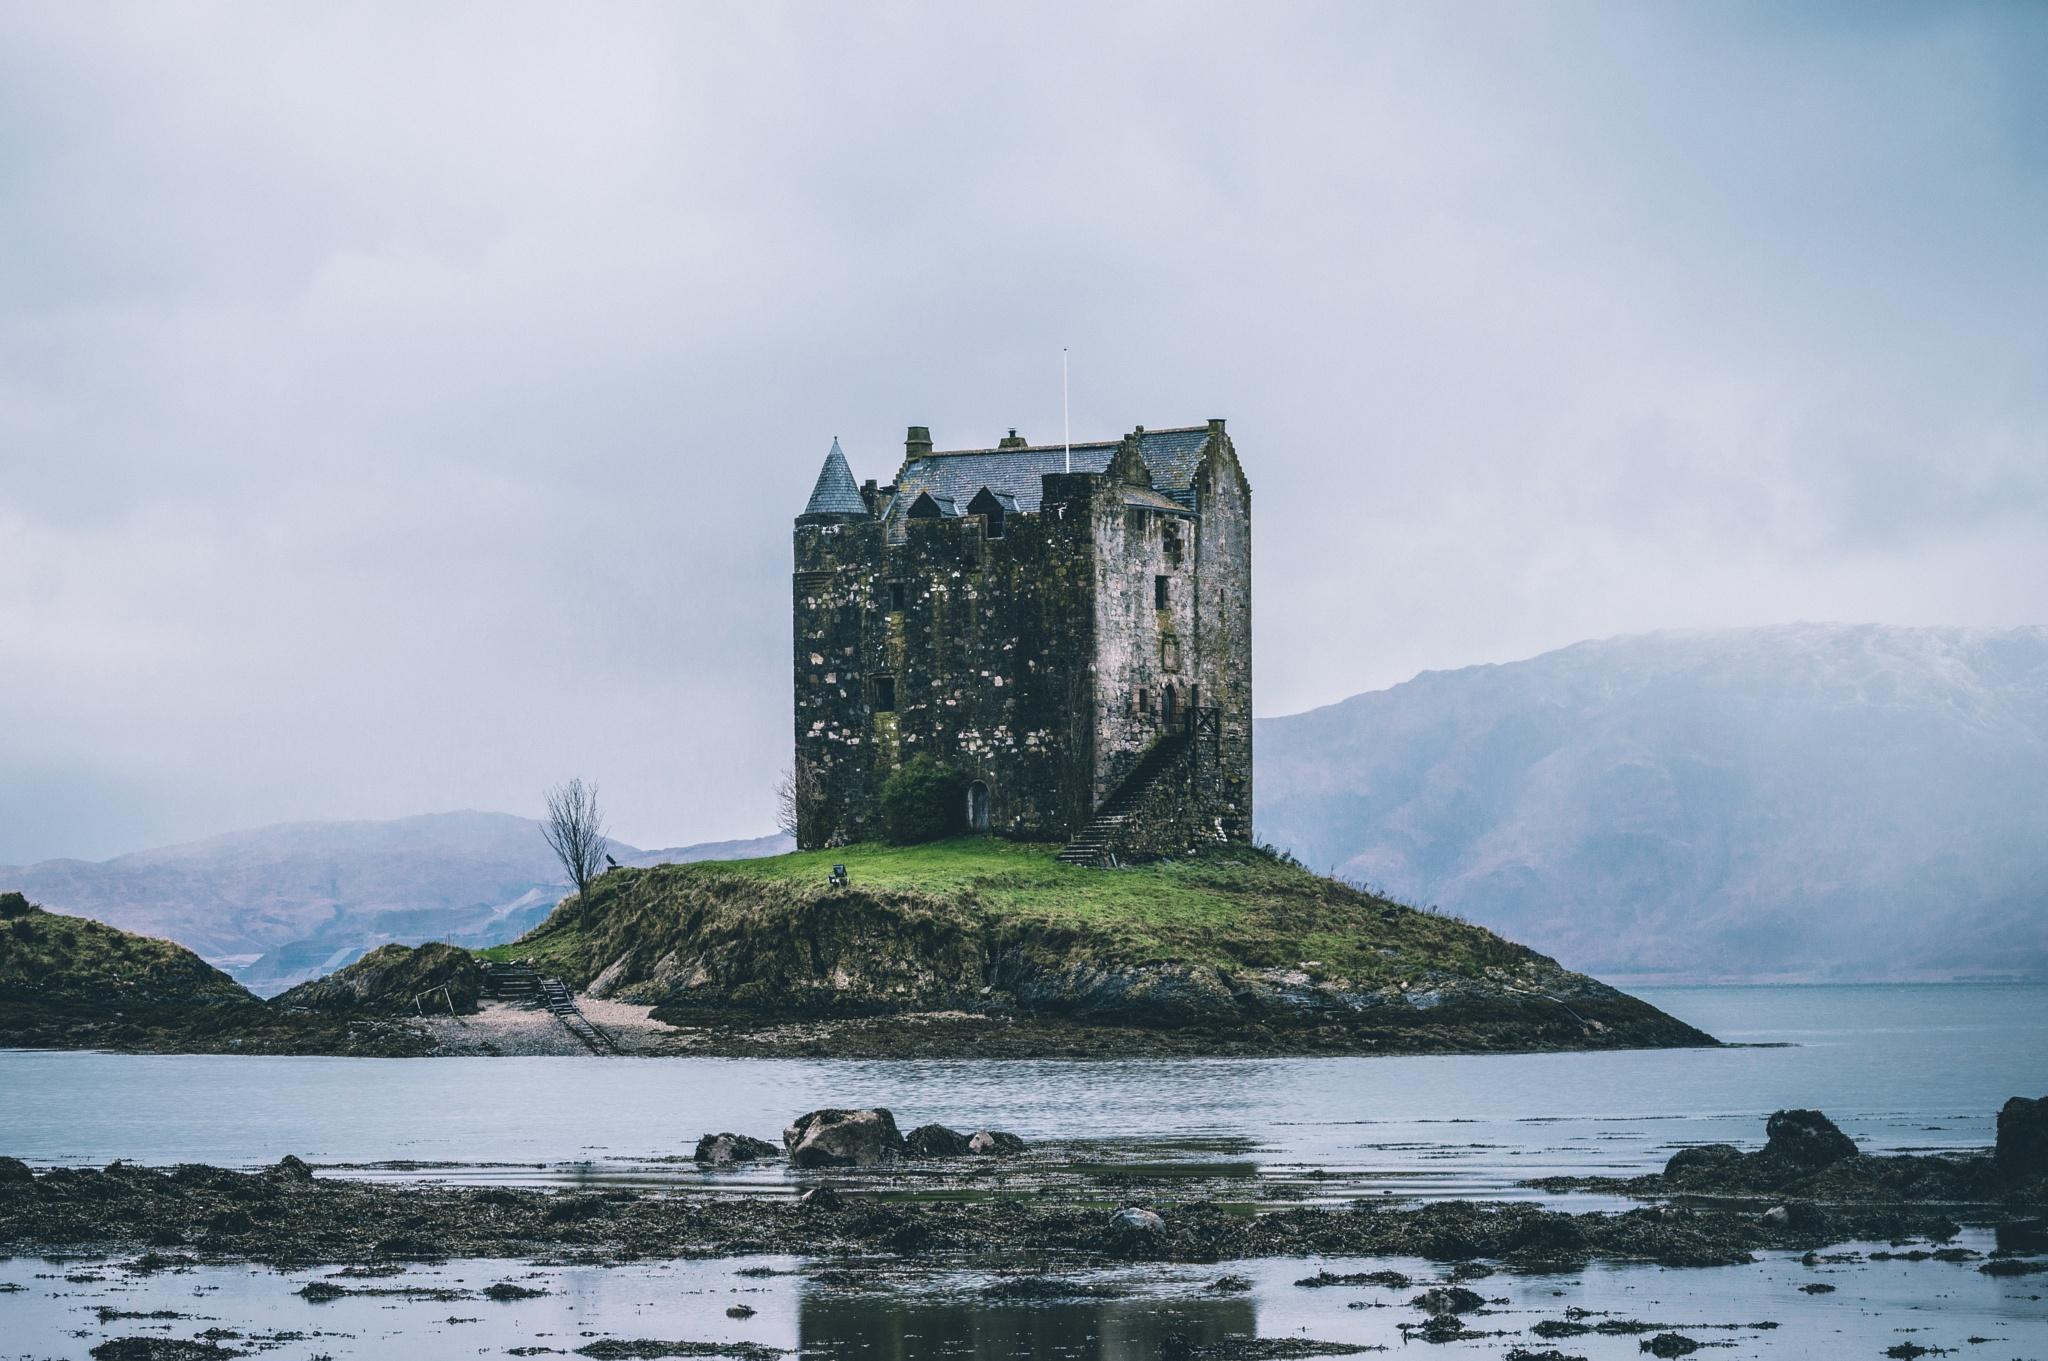 Castle Stalker on the Loch by KevinLeadbetter